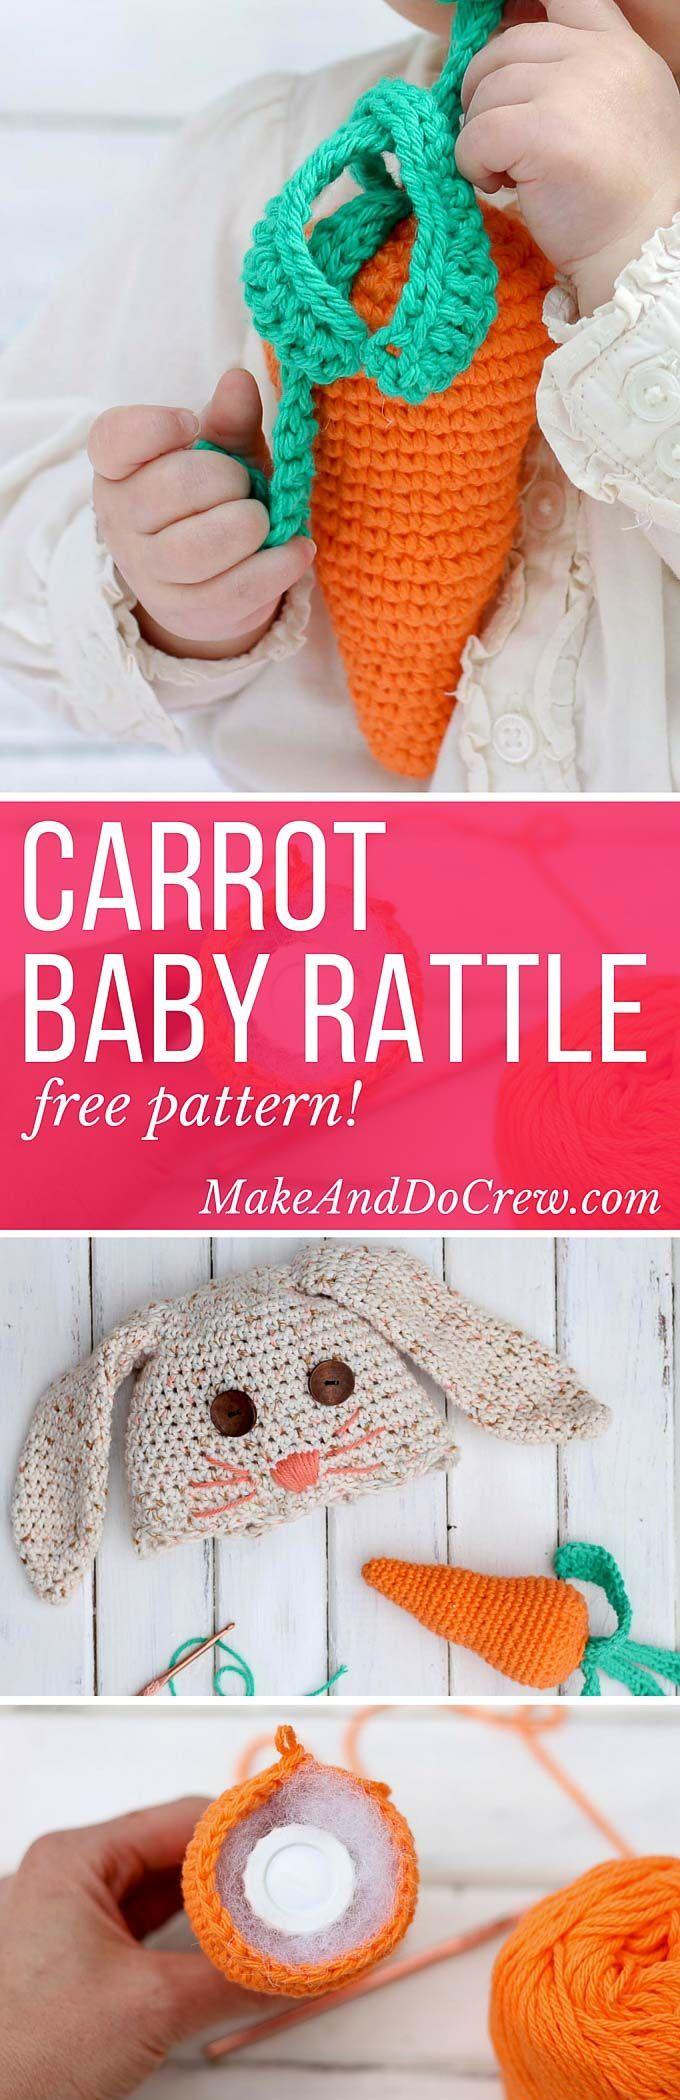 Free Crochet Baby Toy Pattern - an Amigurumi Carrot Rattle!